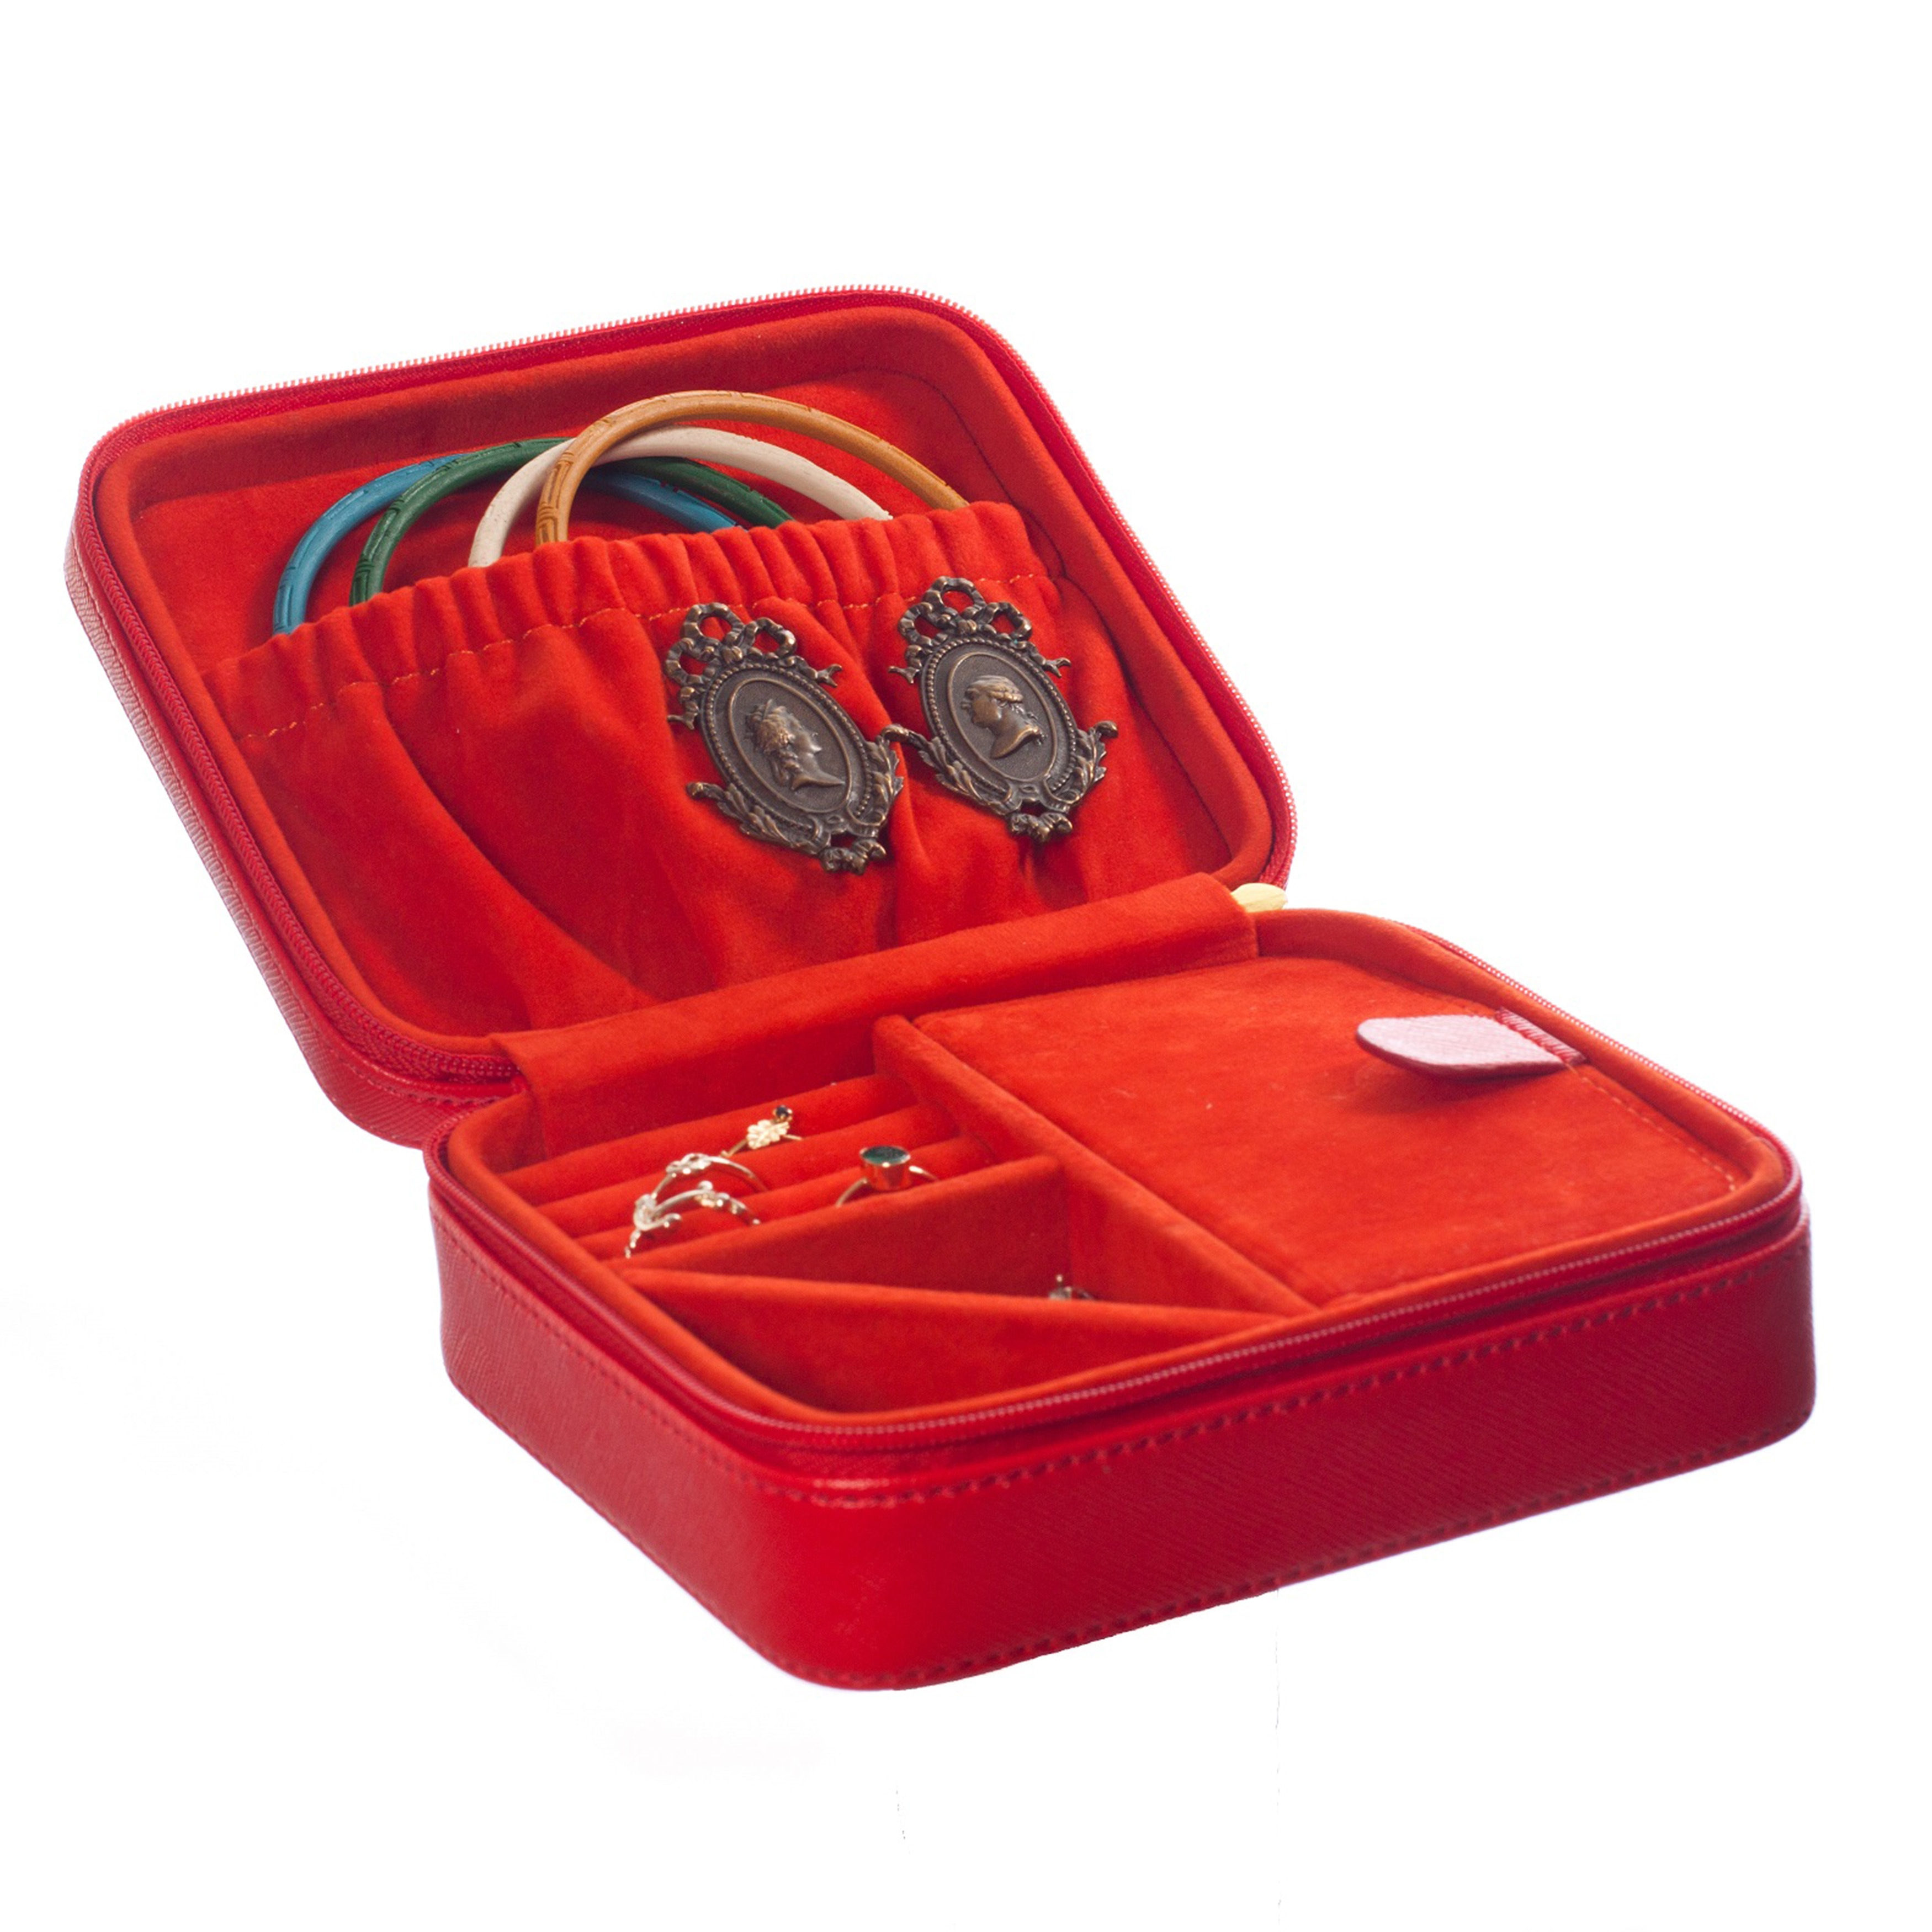 The Classy Case: Leather Jewelry Box Travel Case (Purple)